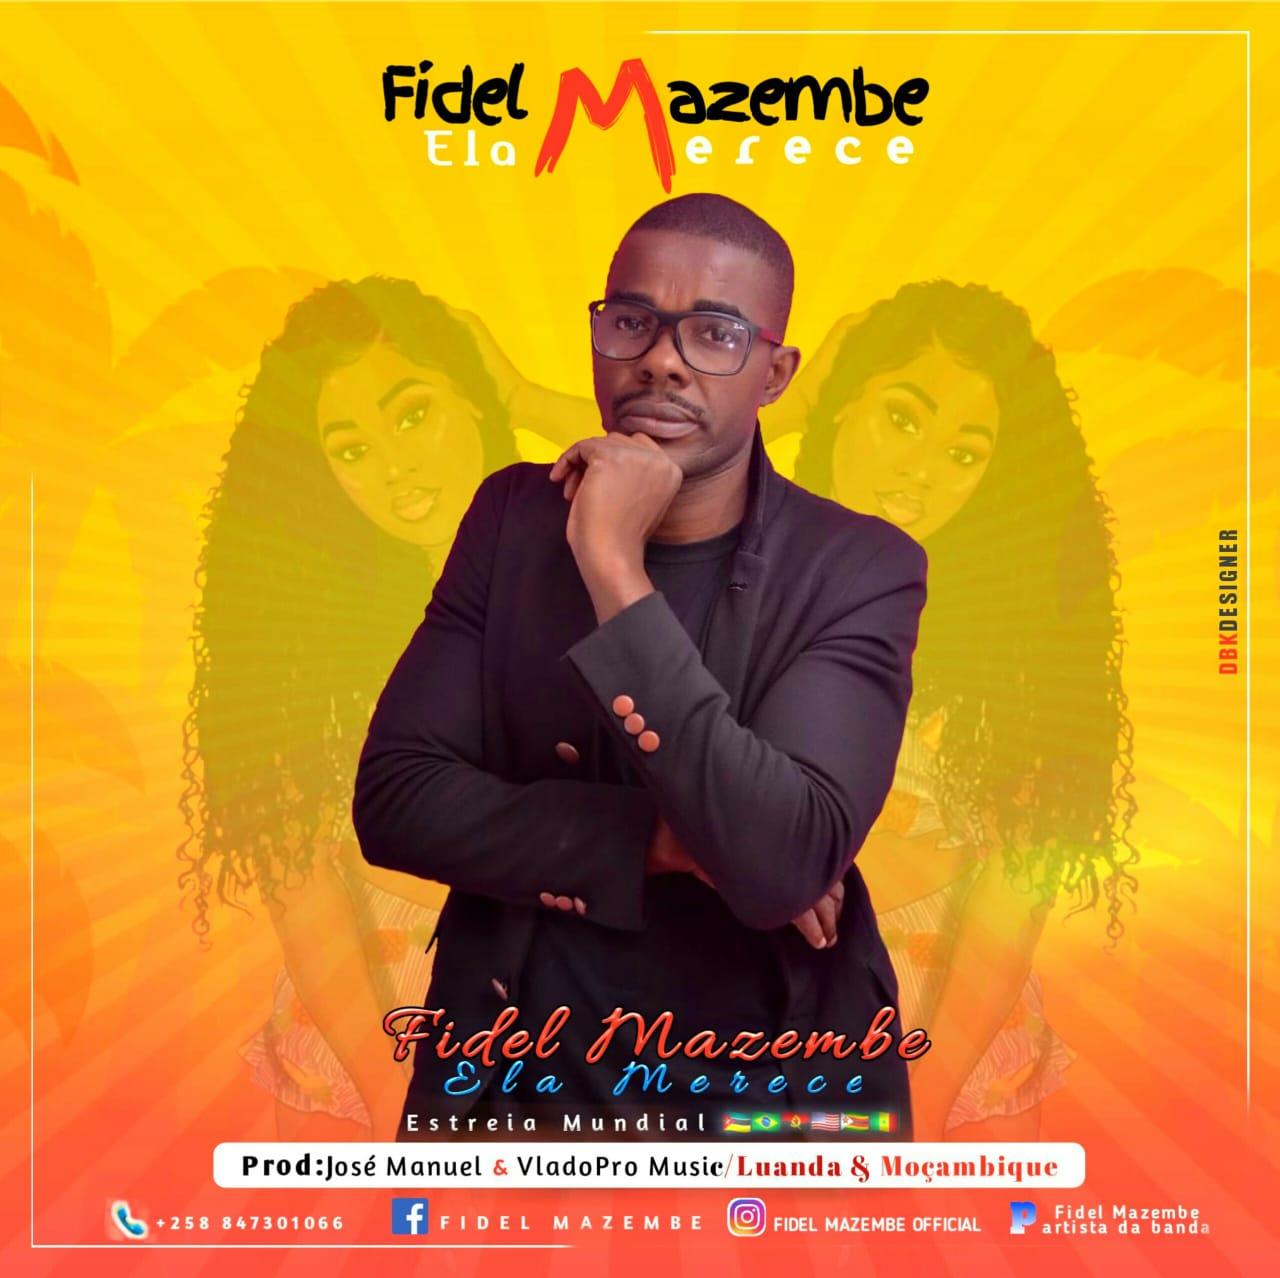 Fidel Mazembe - Ela Merece ( SvL Music )[ 2k19 Official